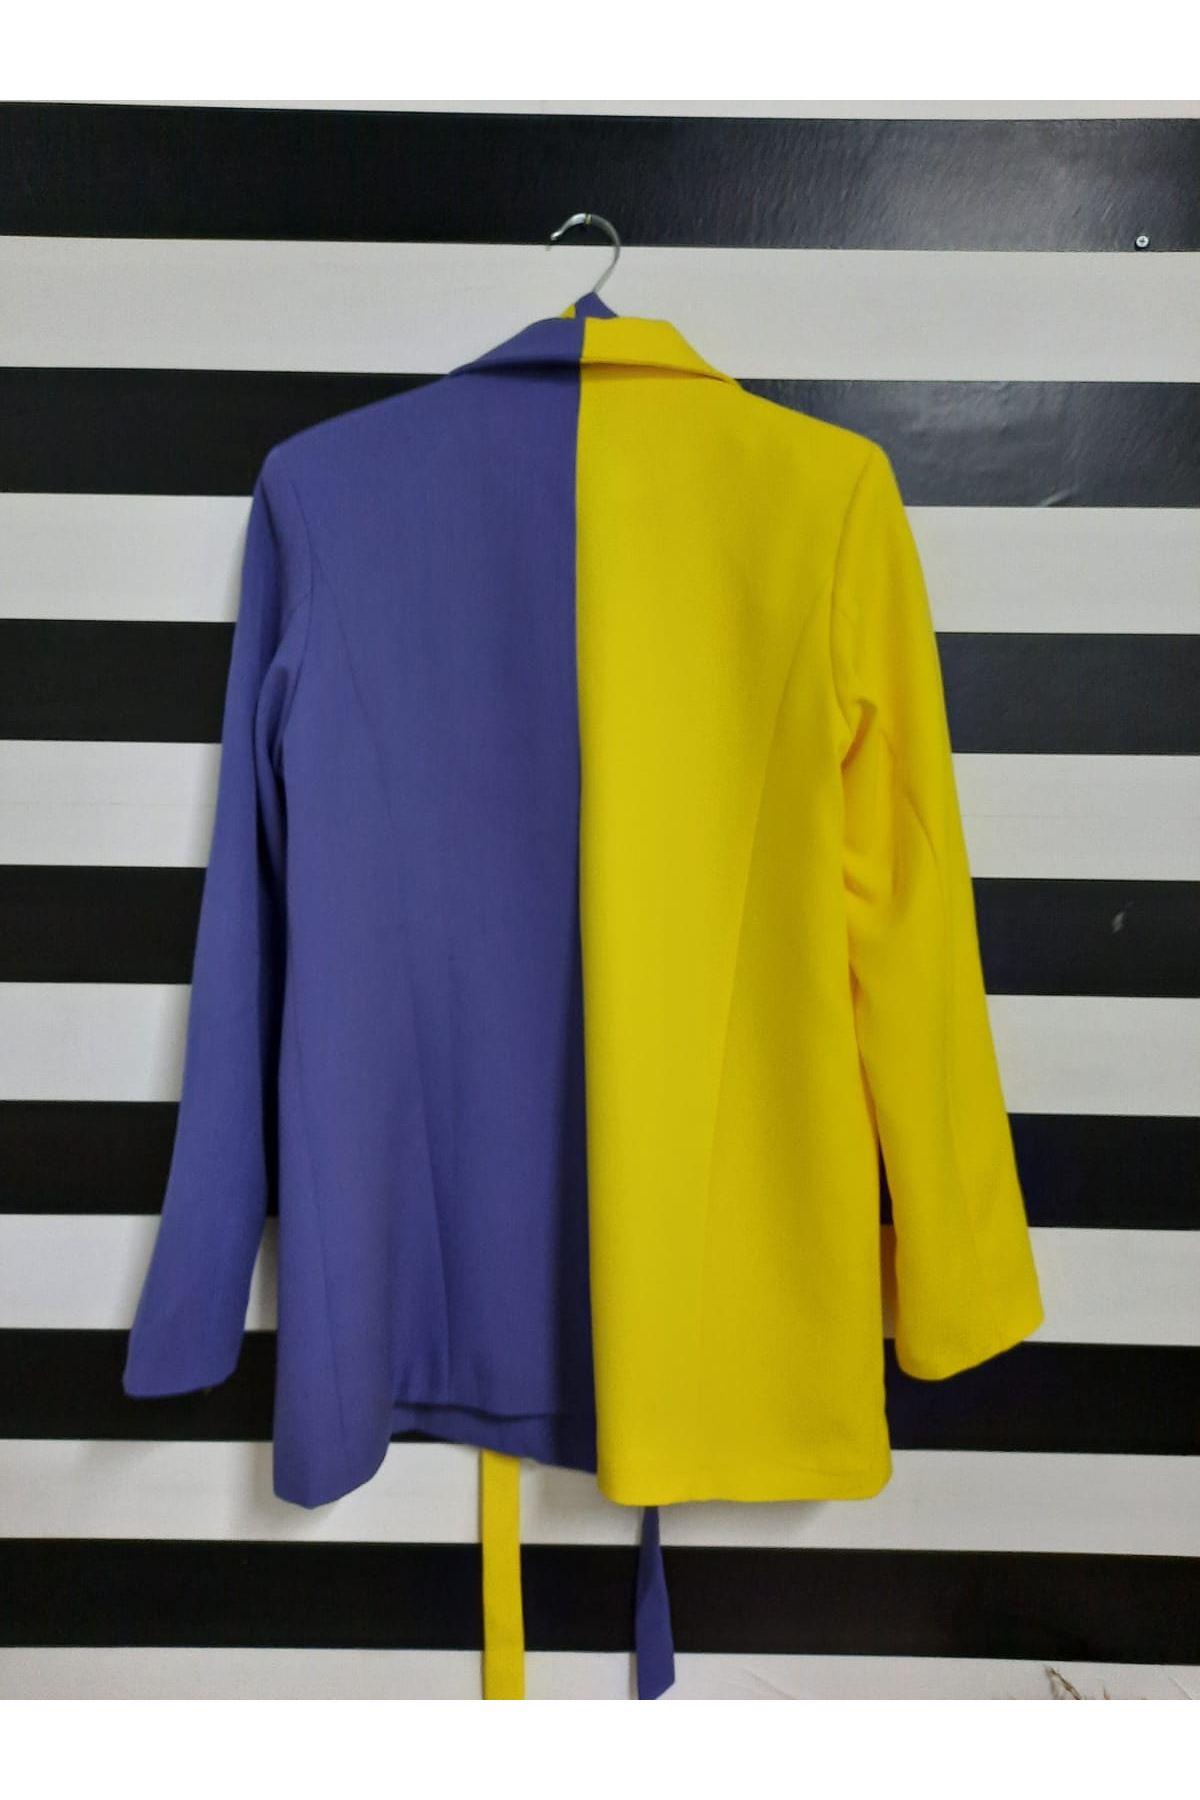 Çift Renk Kuşaklı Ceket - MOR